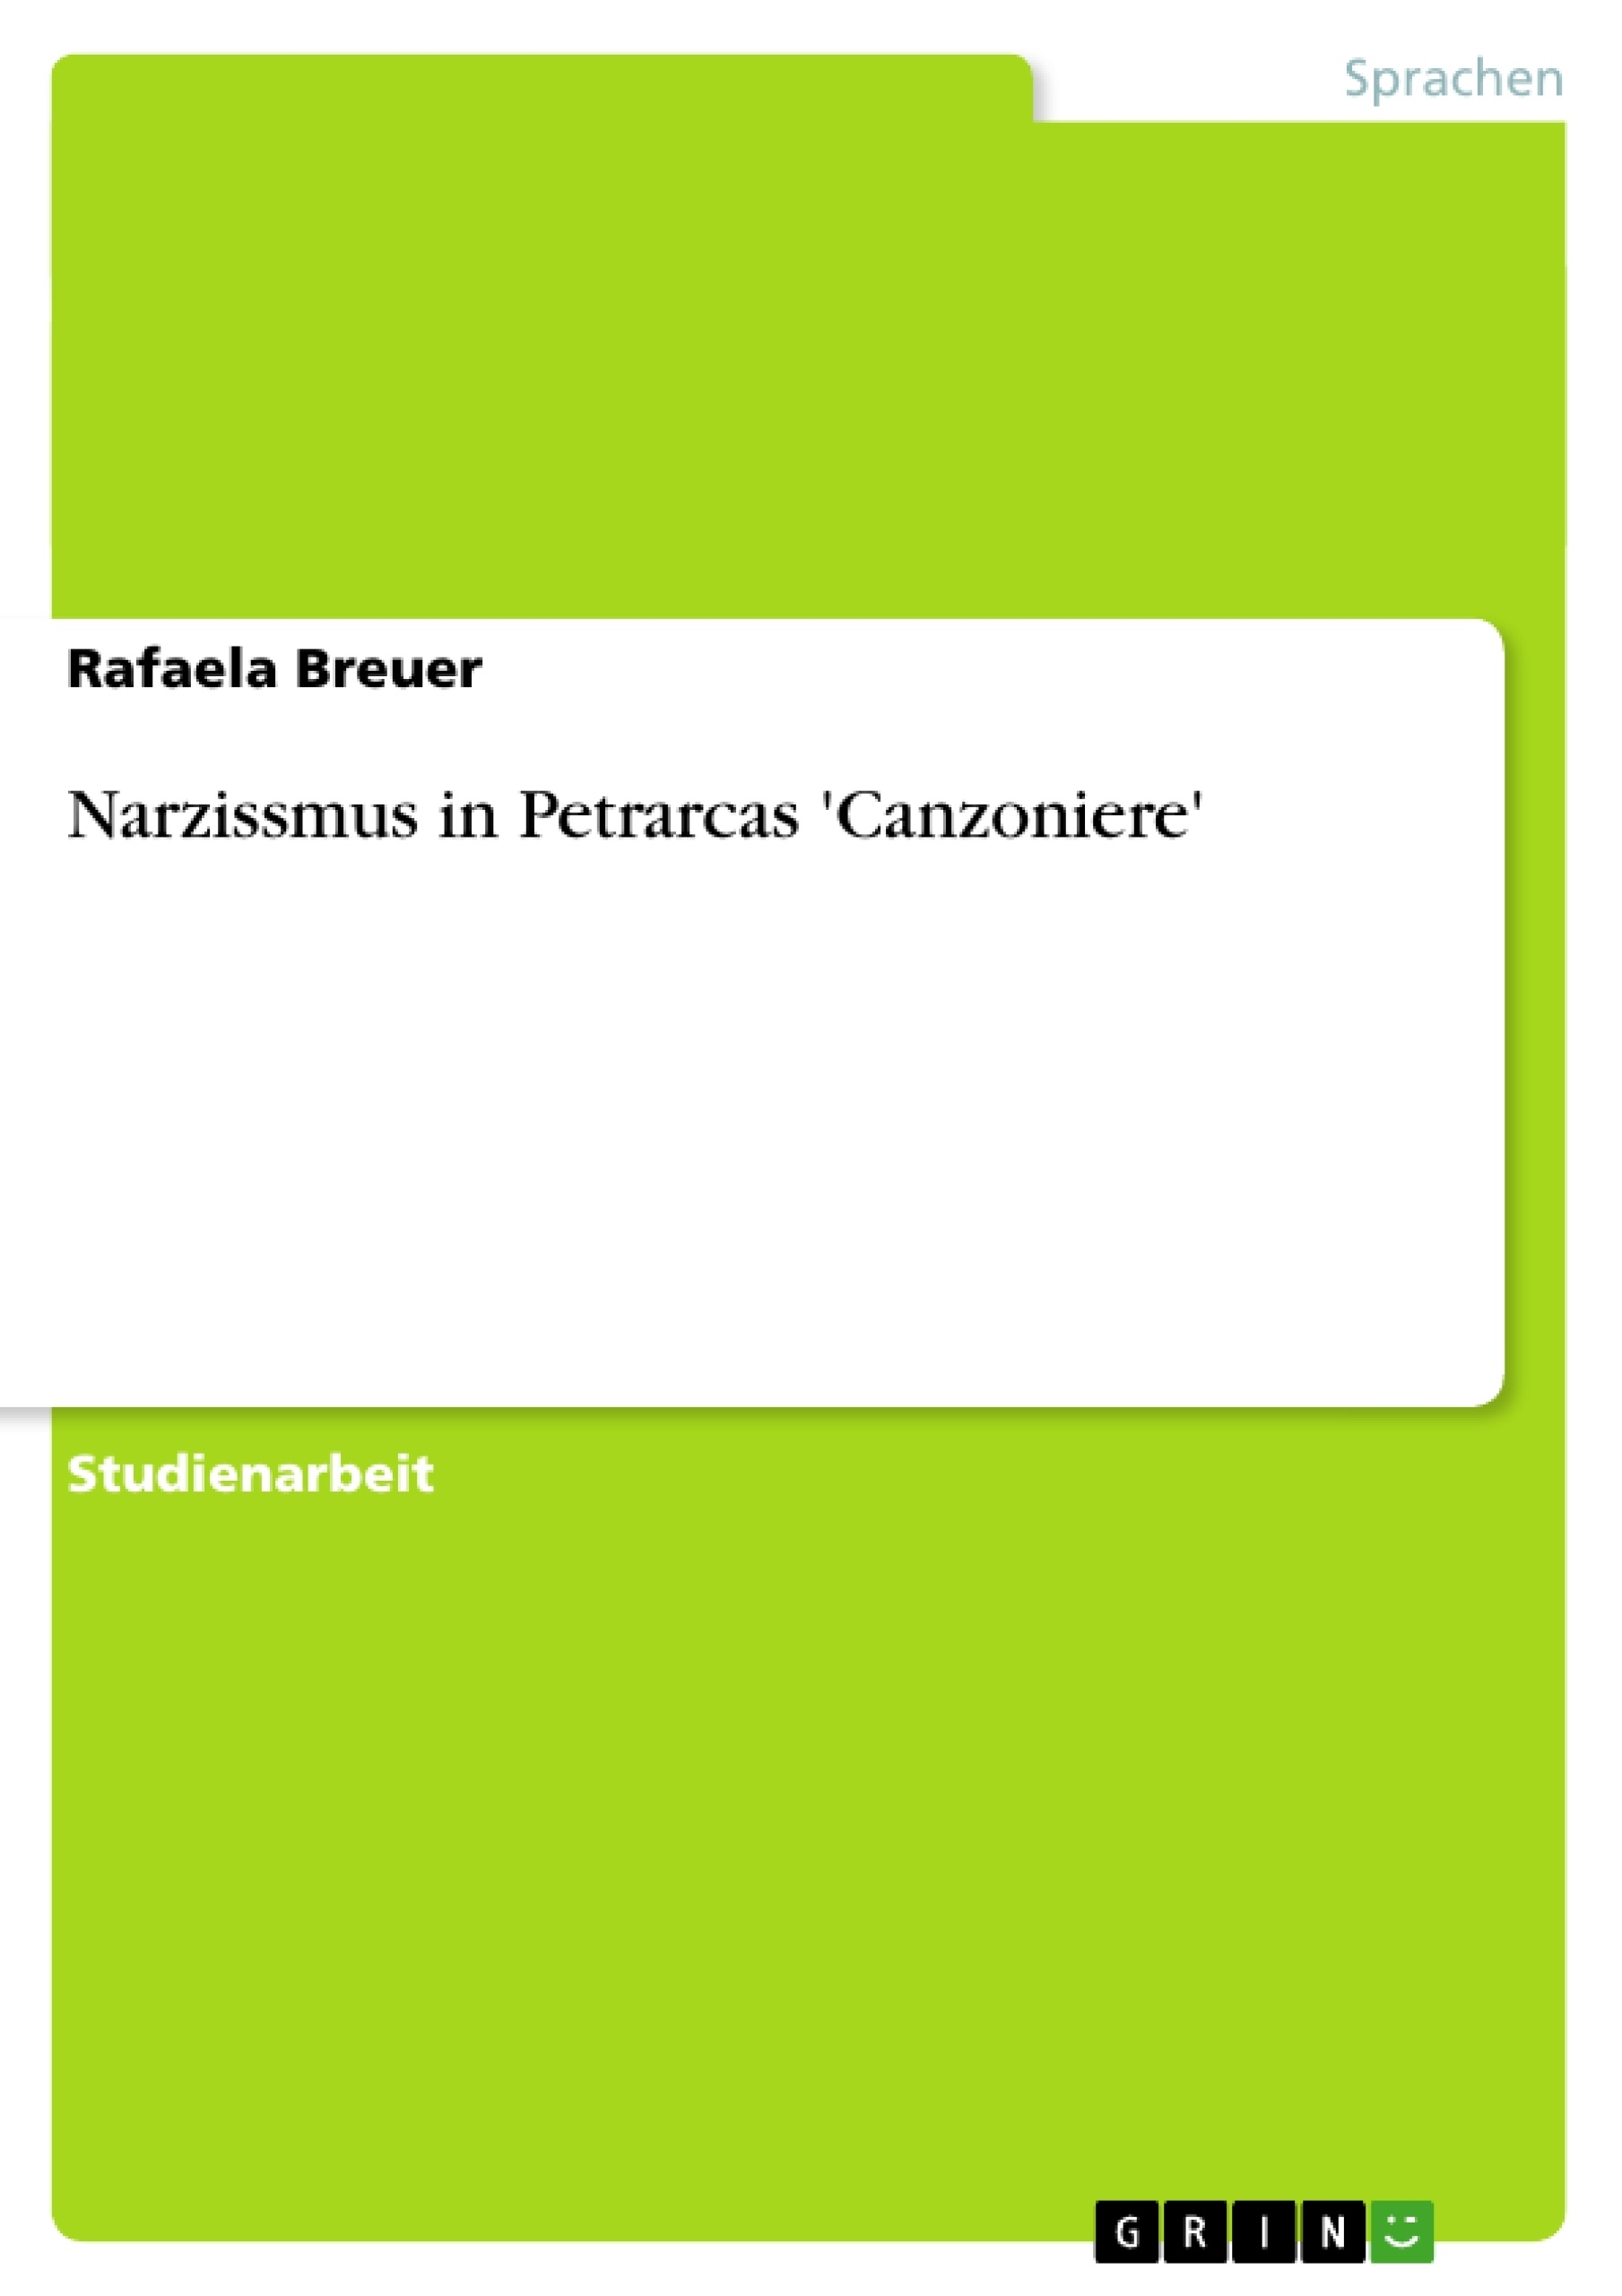 Titel: Narzissmus in Petrarcas 'Canzoniere'